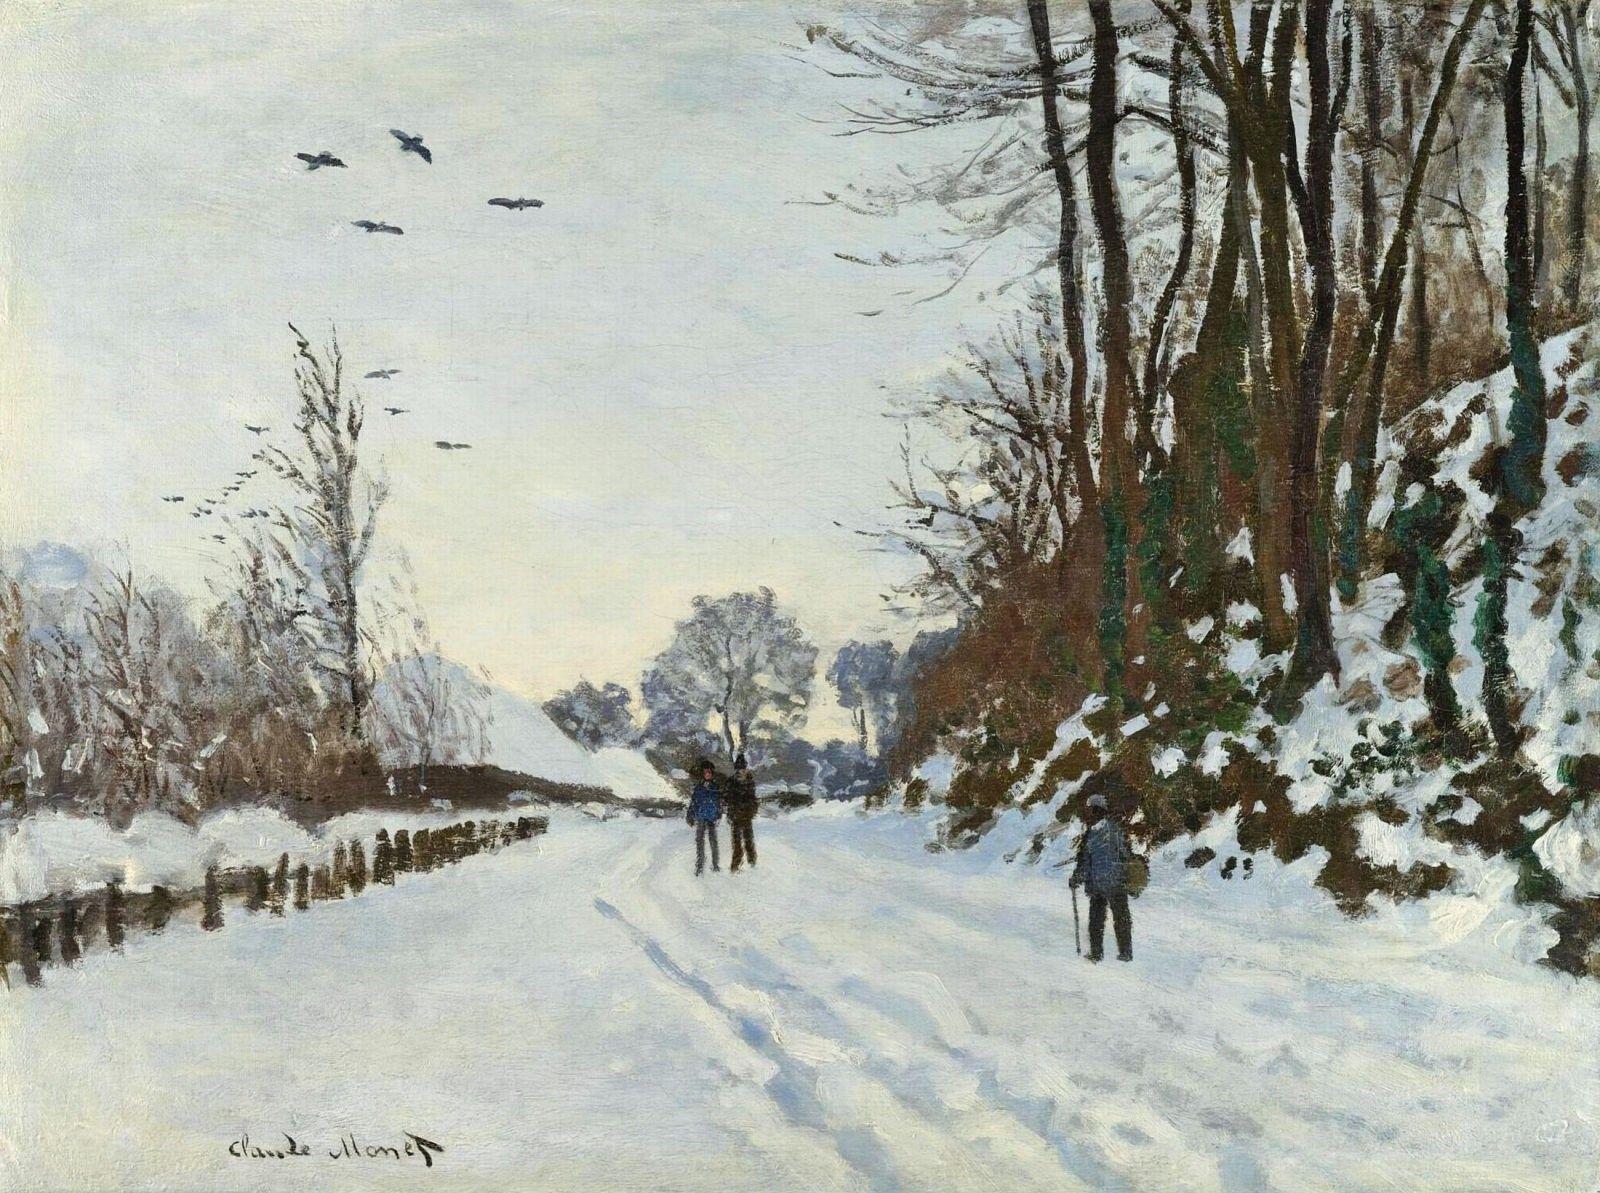 The Road to the Farm of Saint-Simeon in Winter, monet, 1867 | モネ, 雪景, クロードモネ